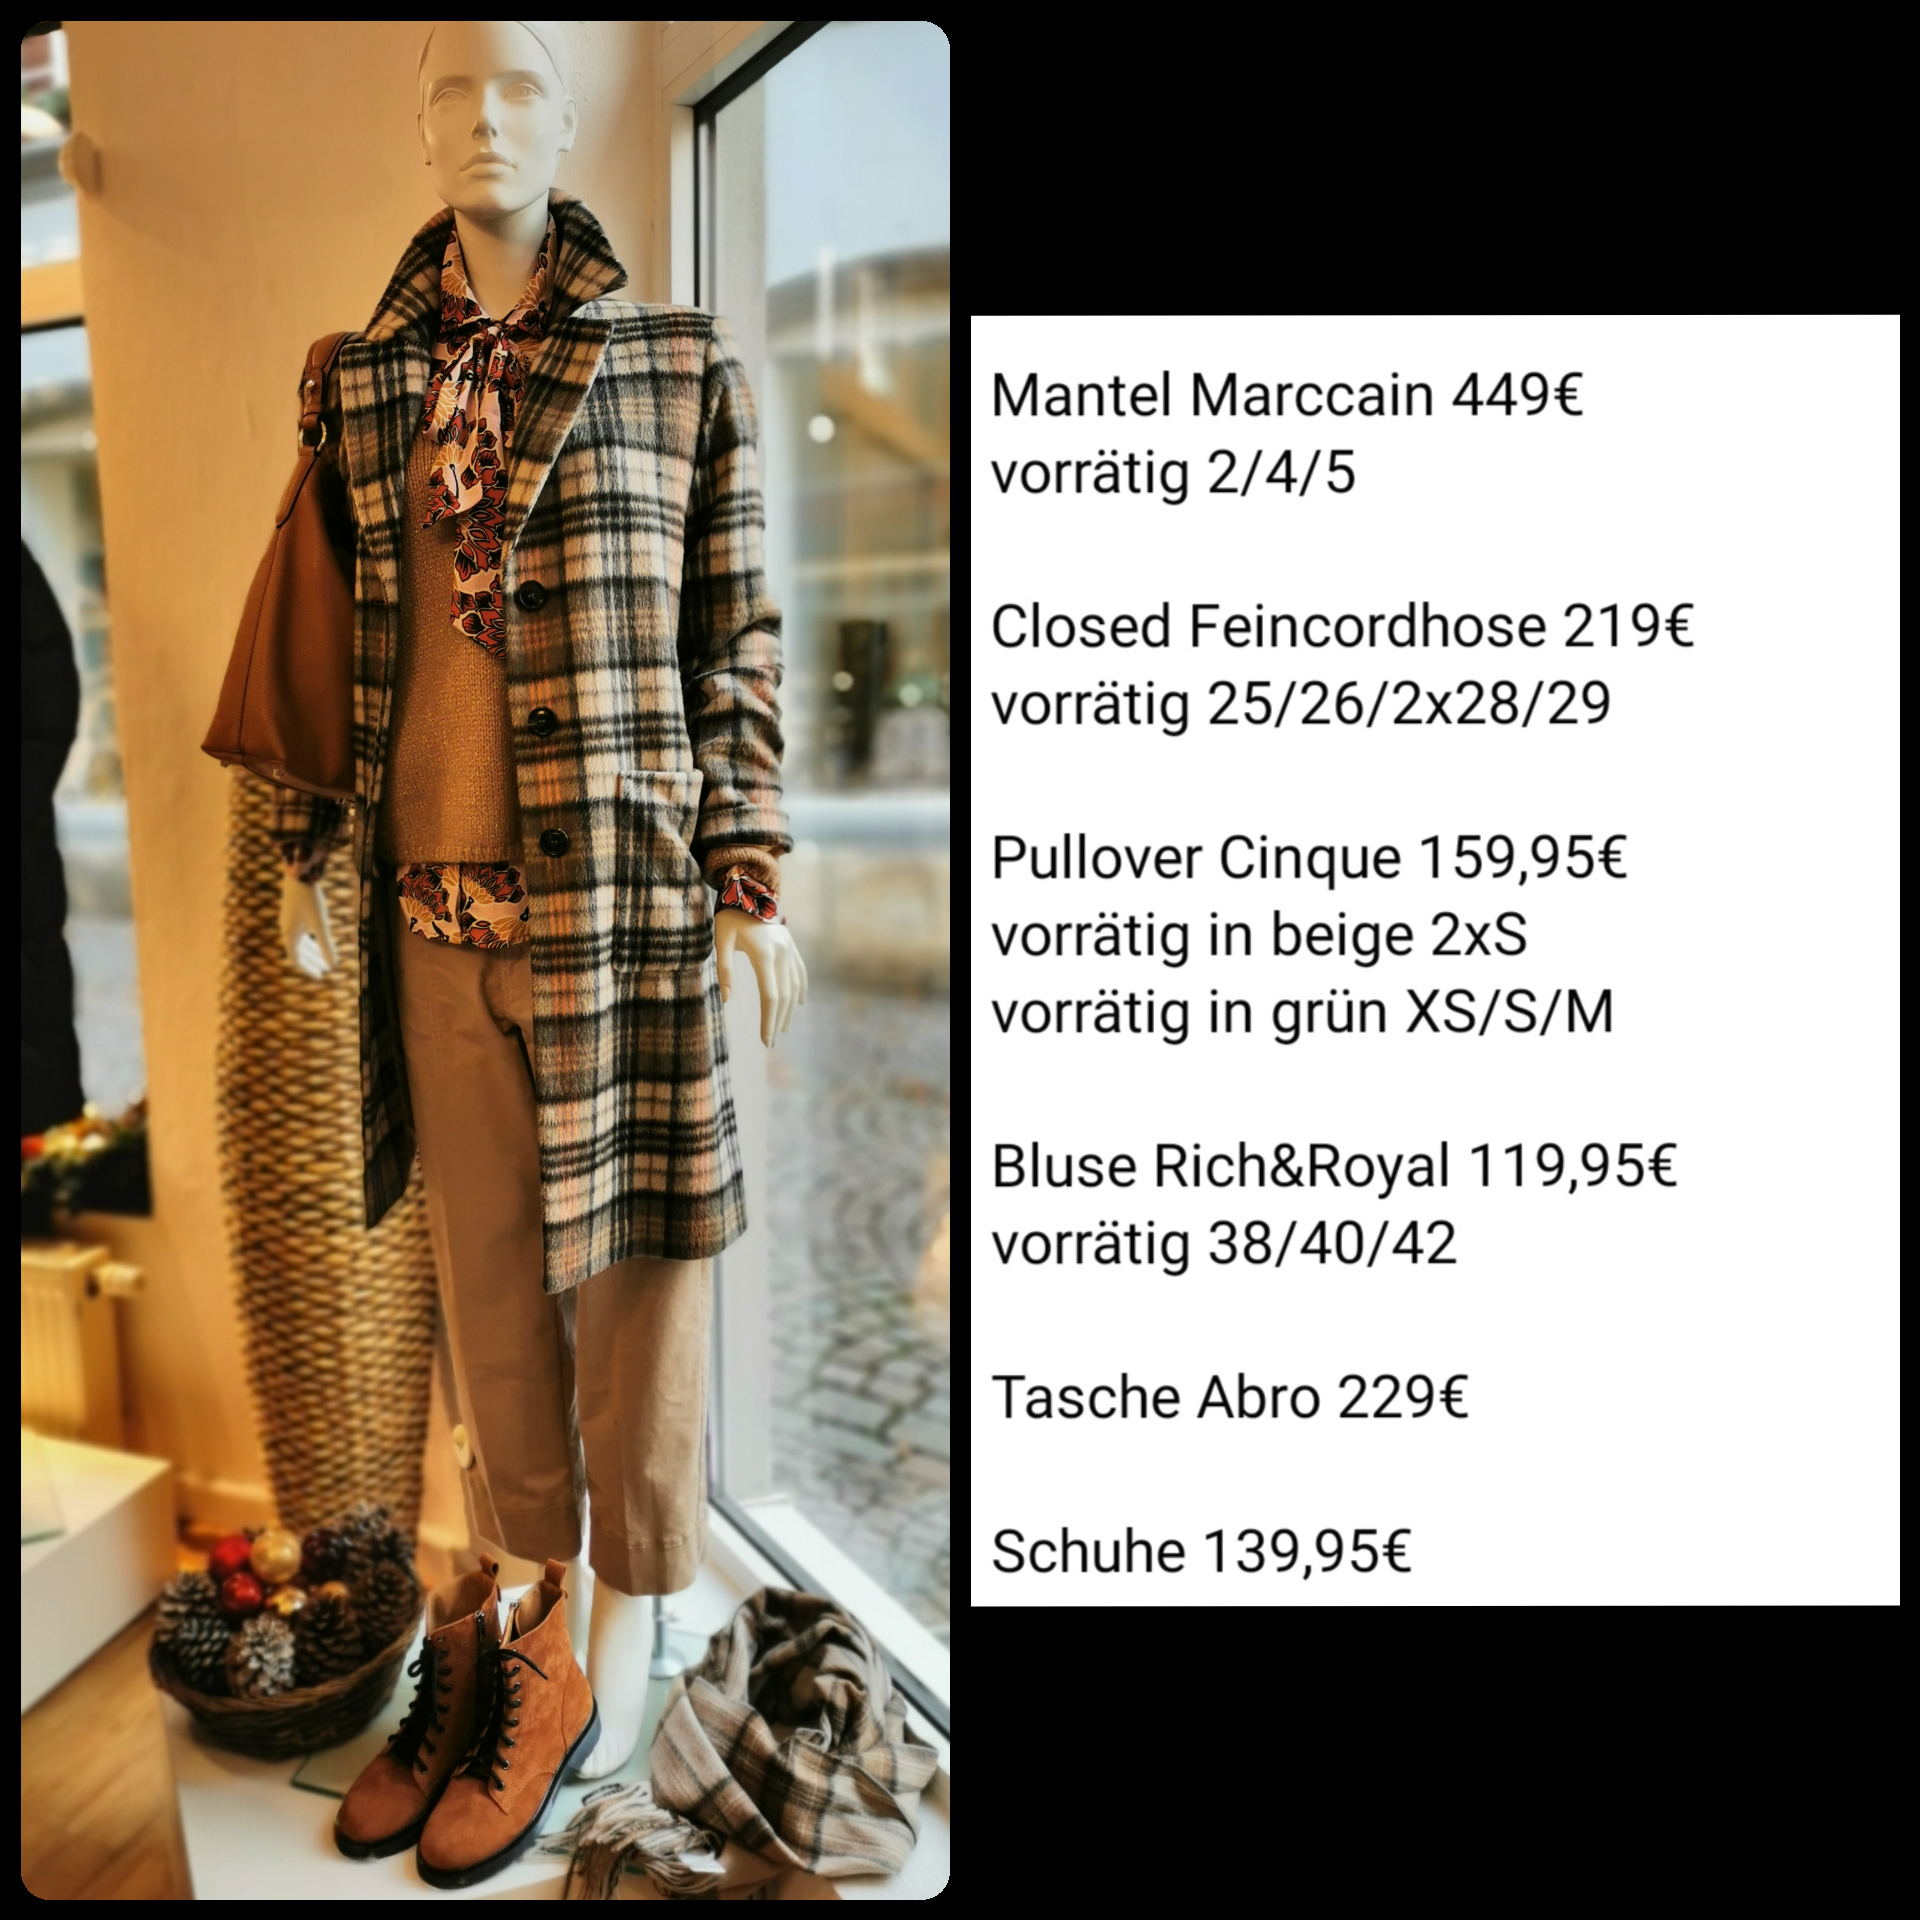 Closed Hose, Marccain Mantel